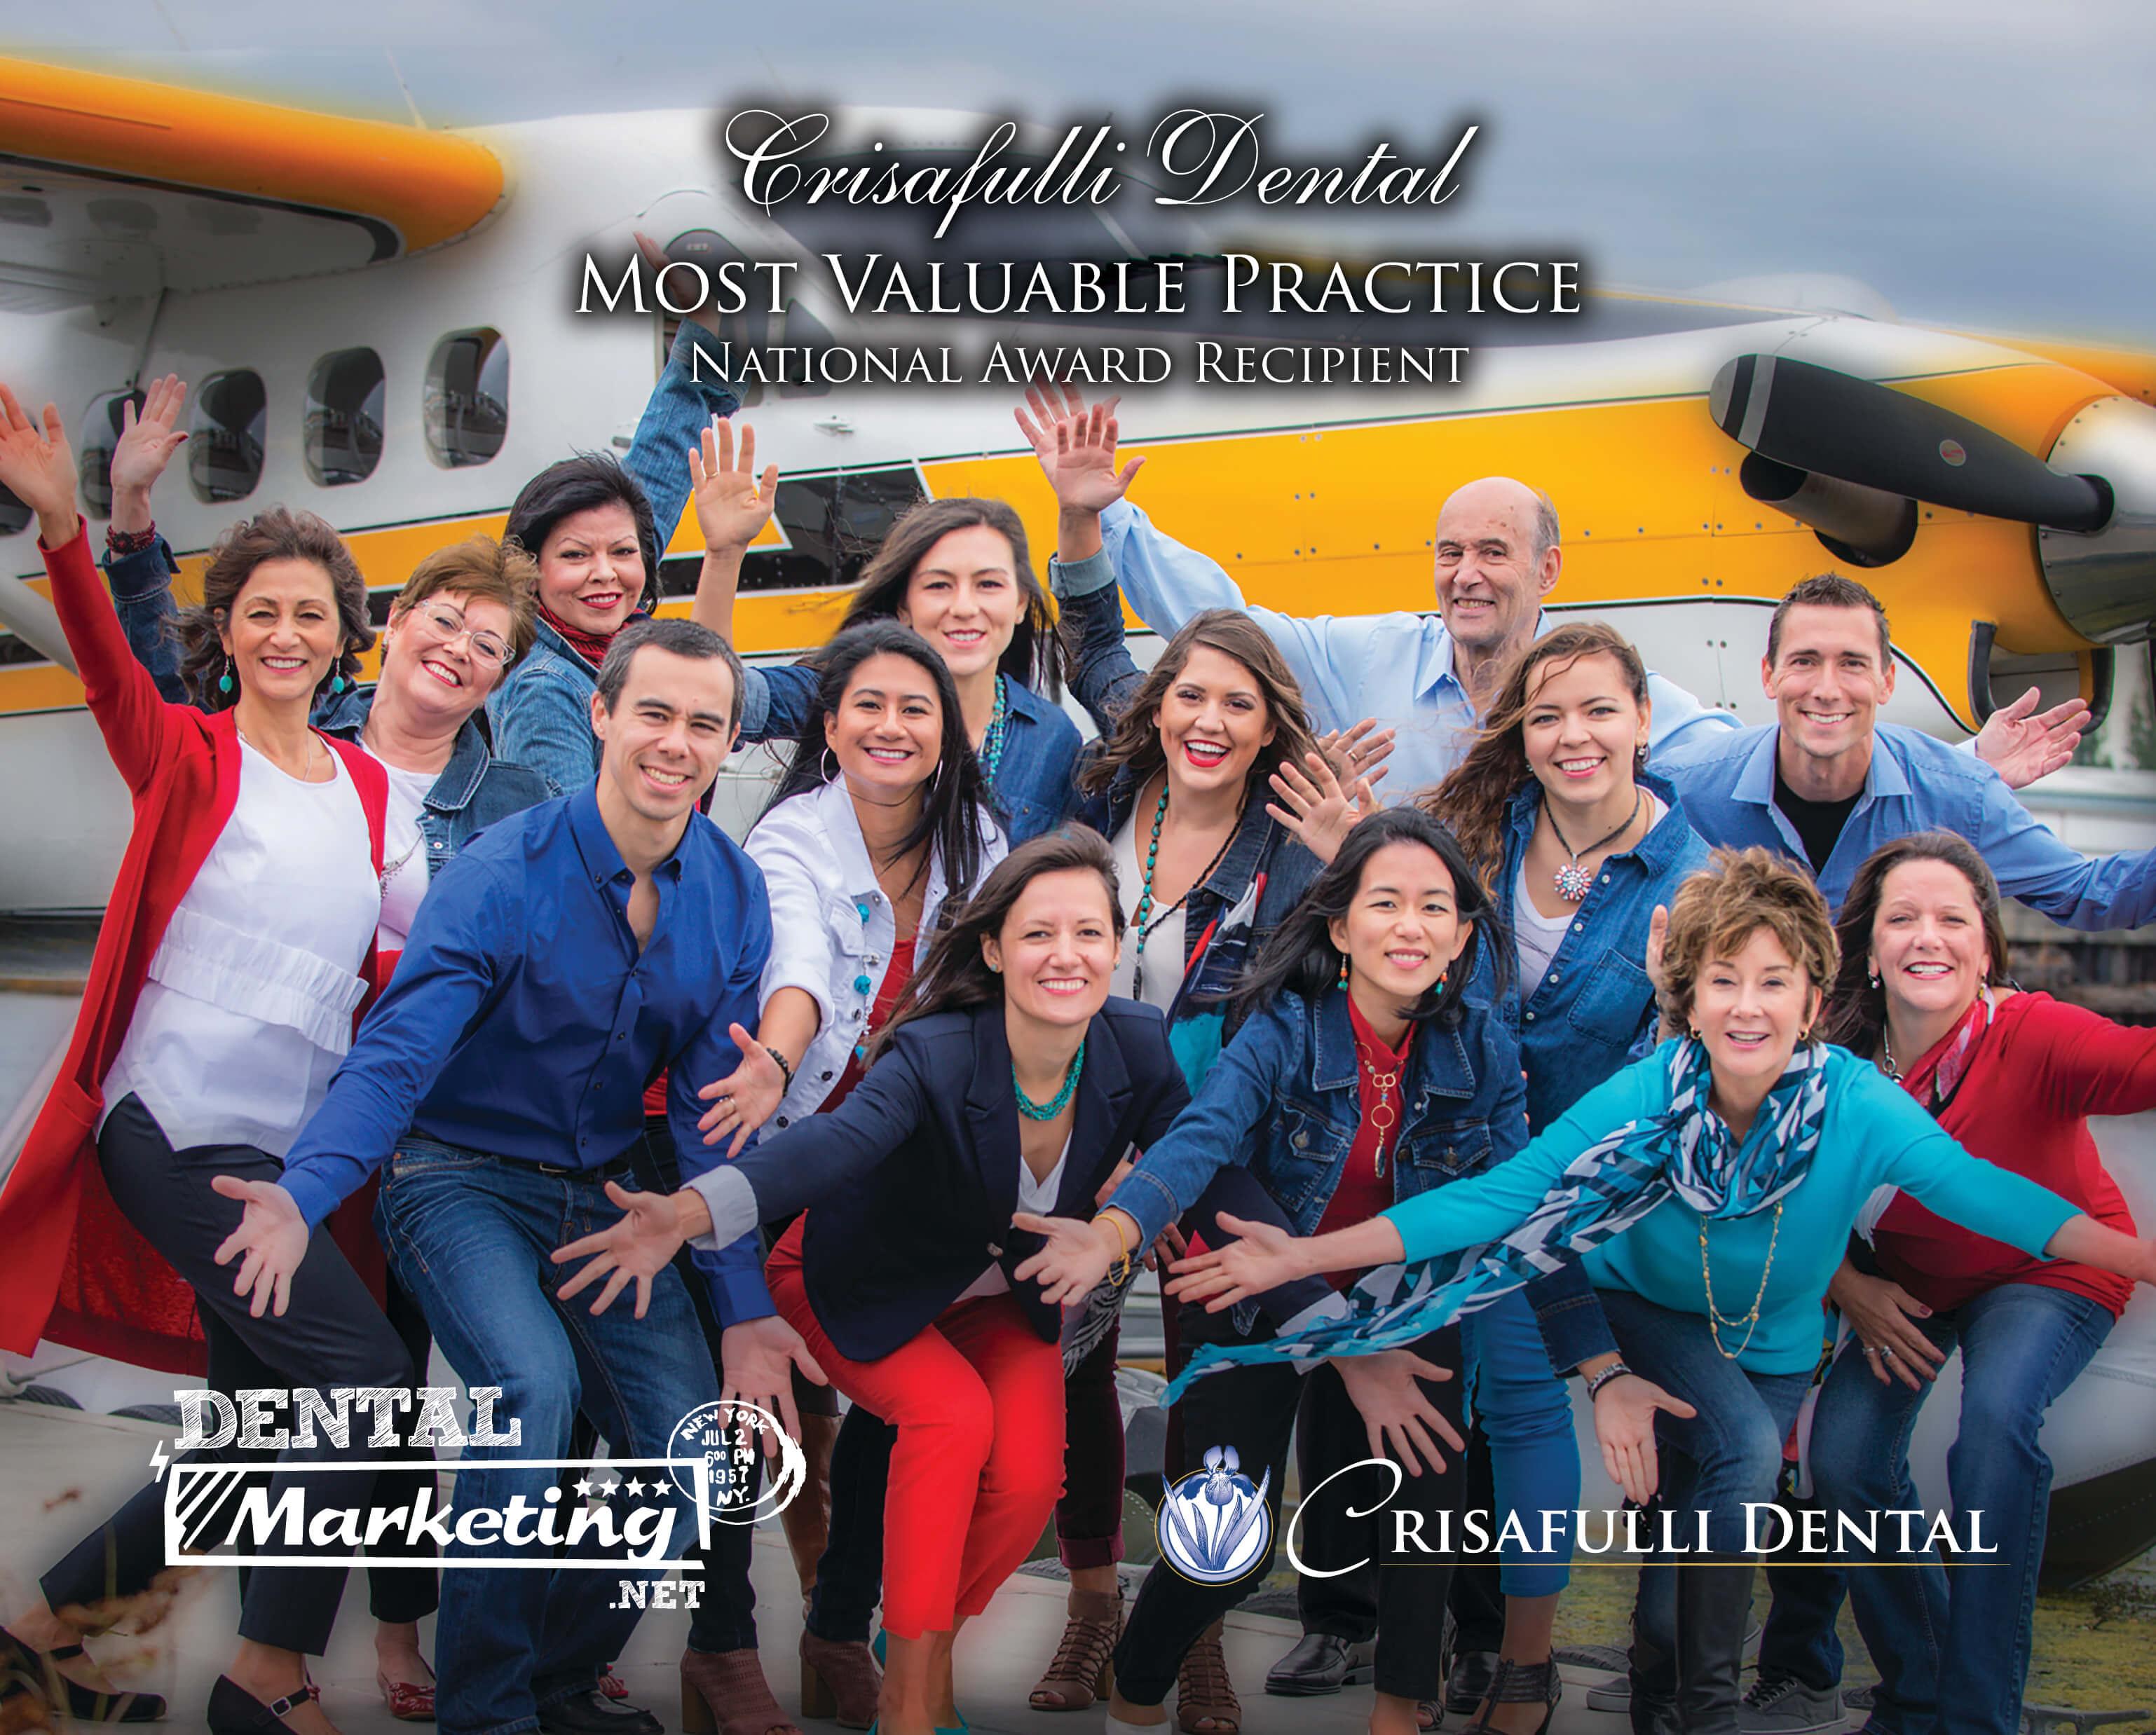 Crisafulli Dental Staff